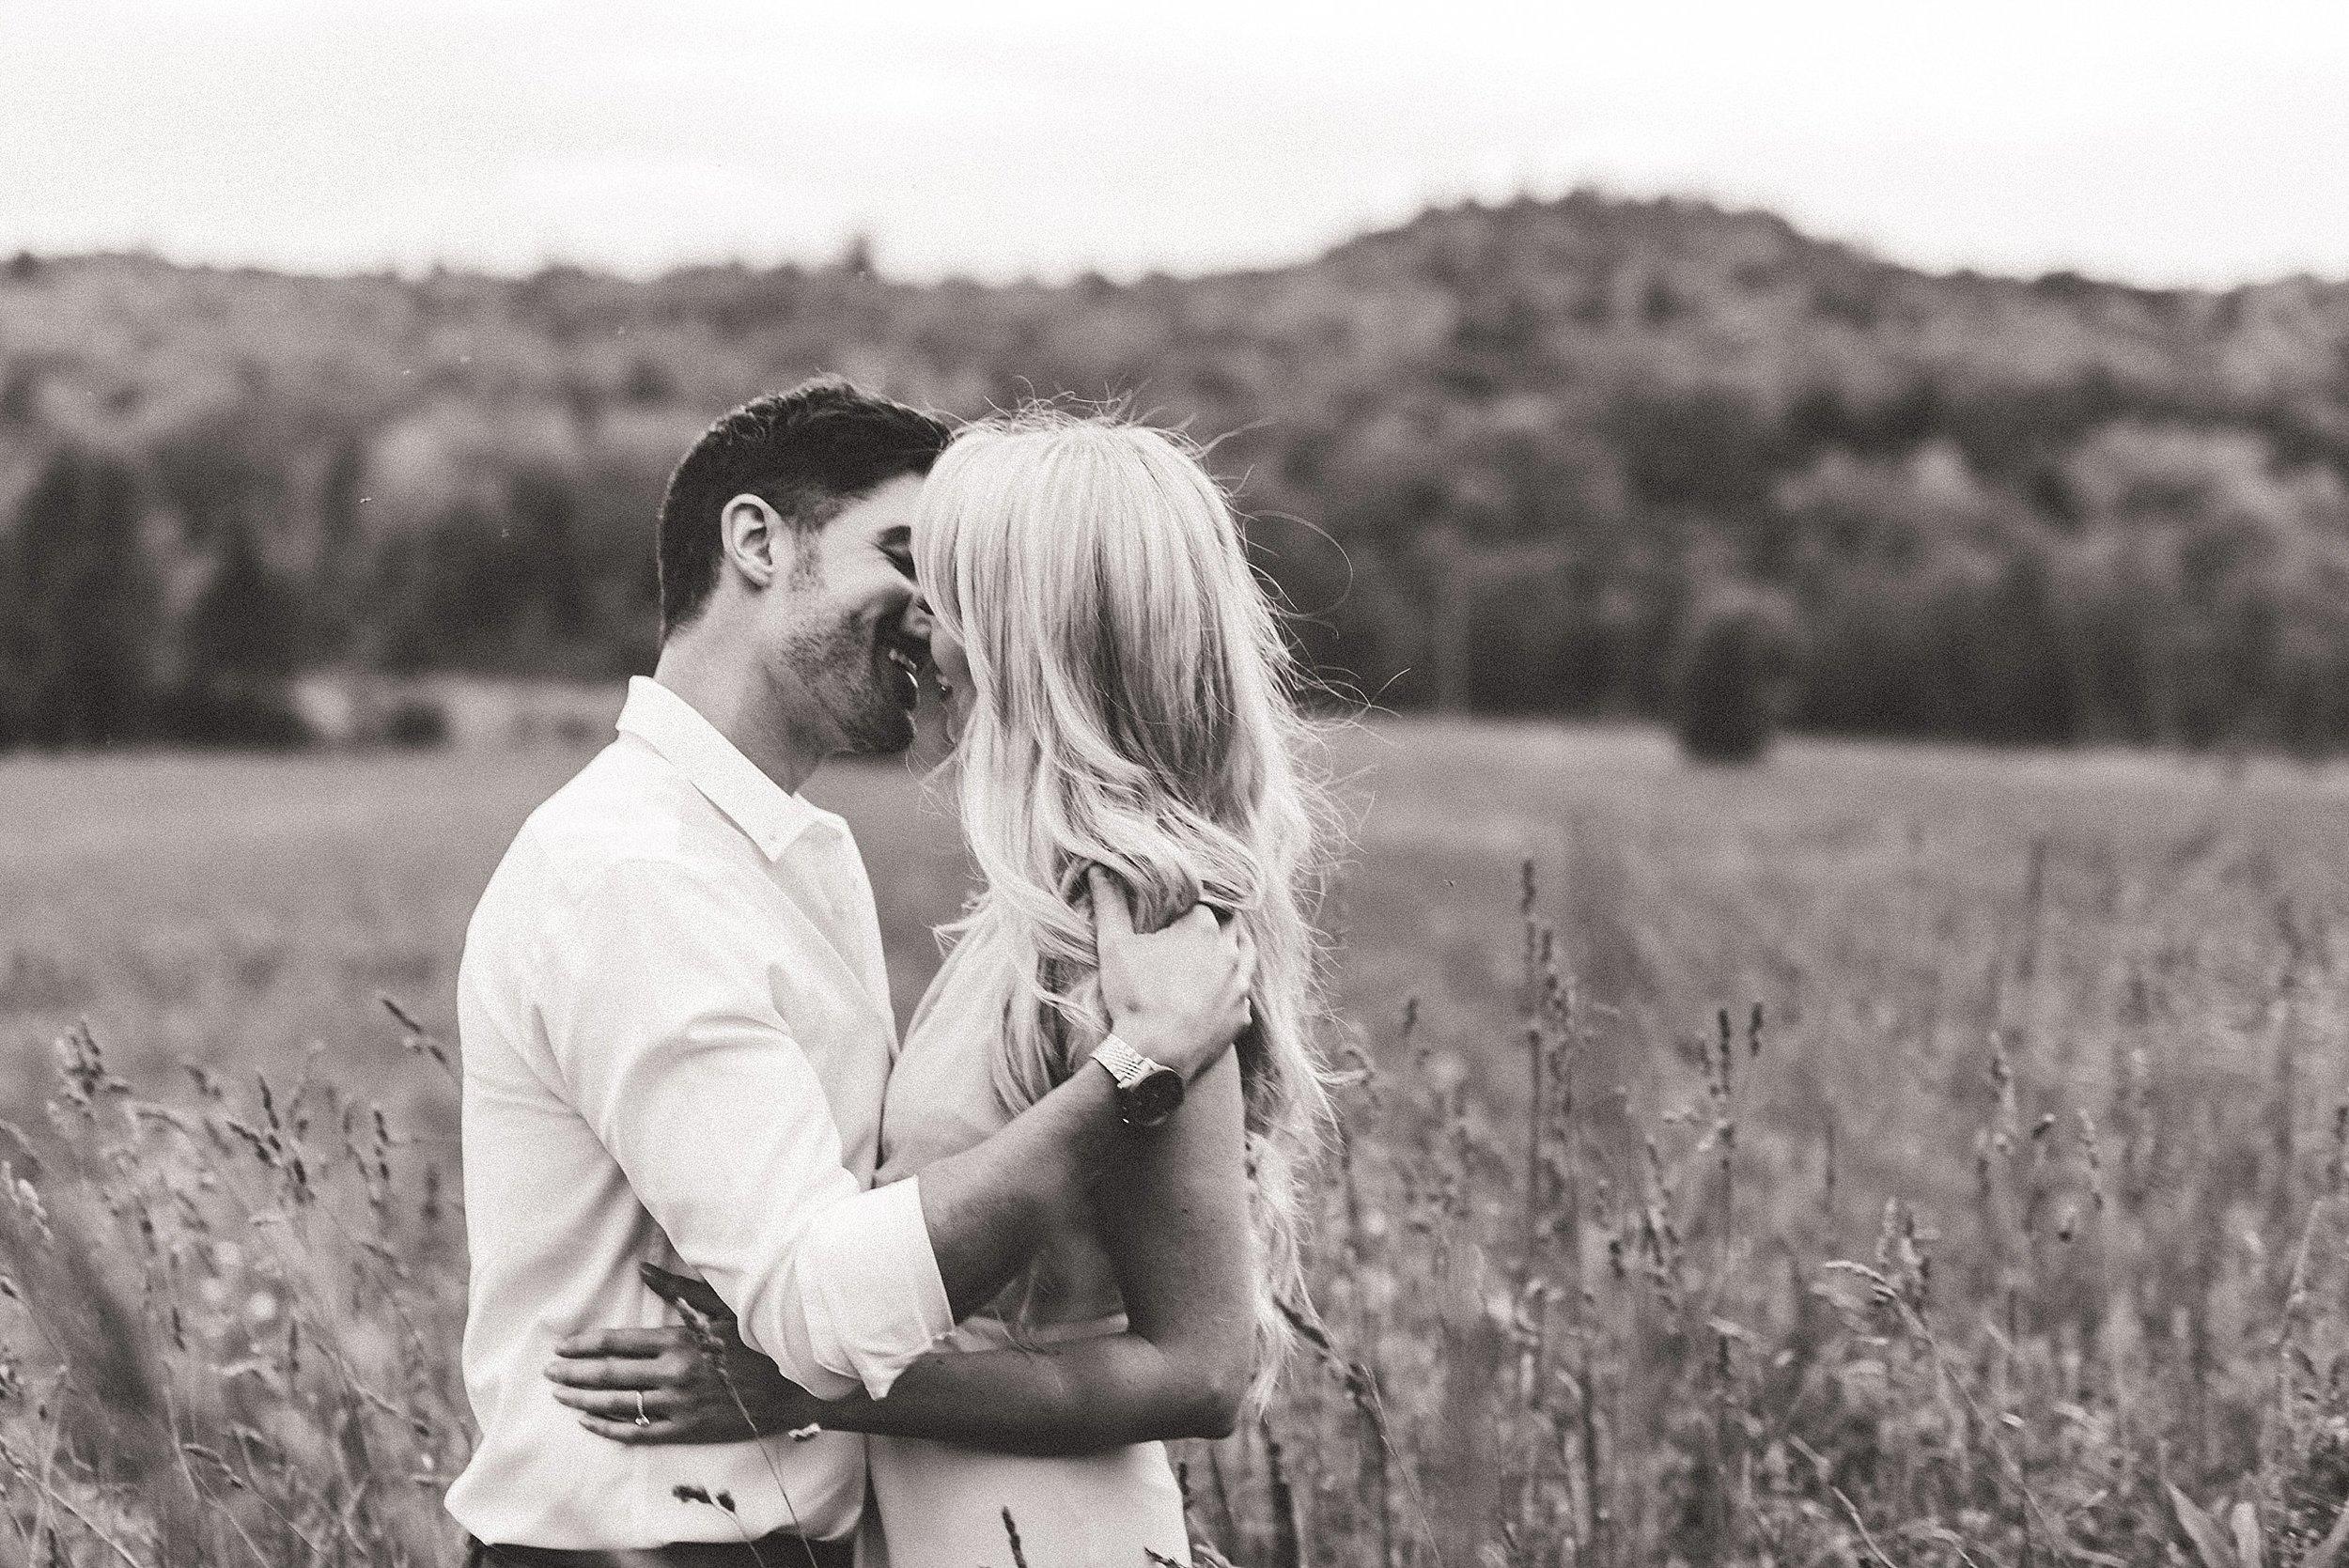 Ali and Batoul Photography - light, airy, indie documentary Ottawa wedding photographer_0009.jpg